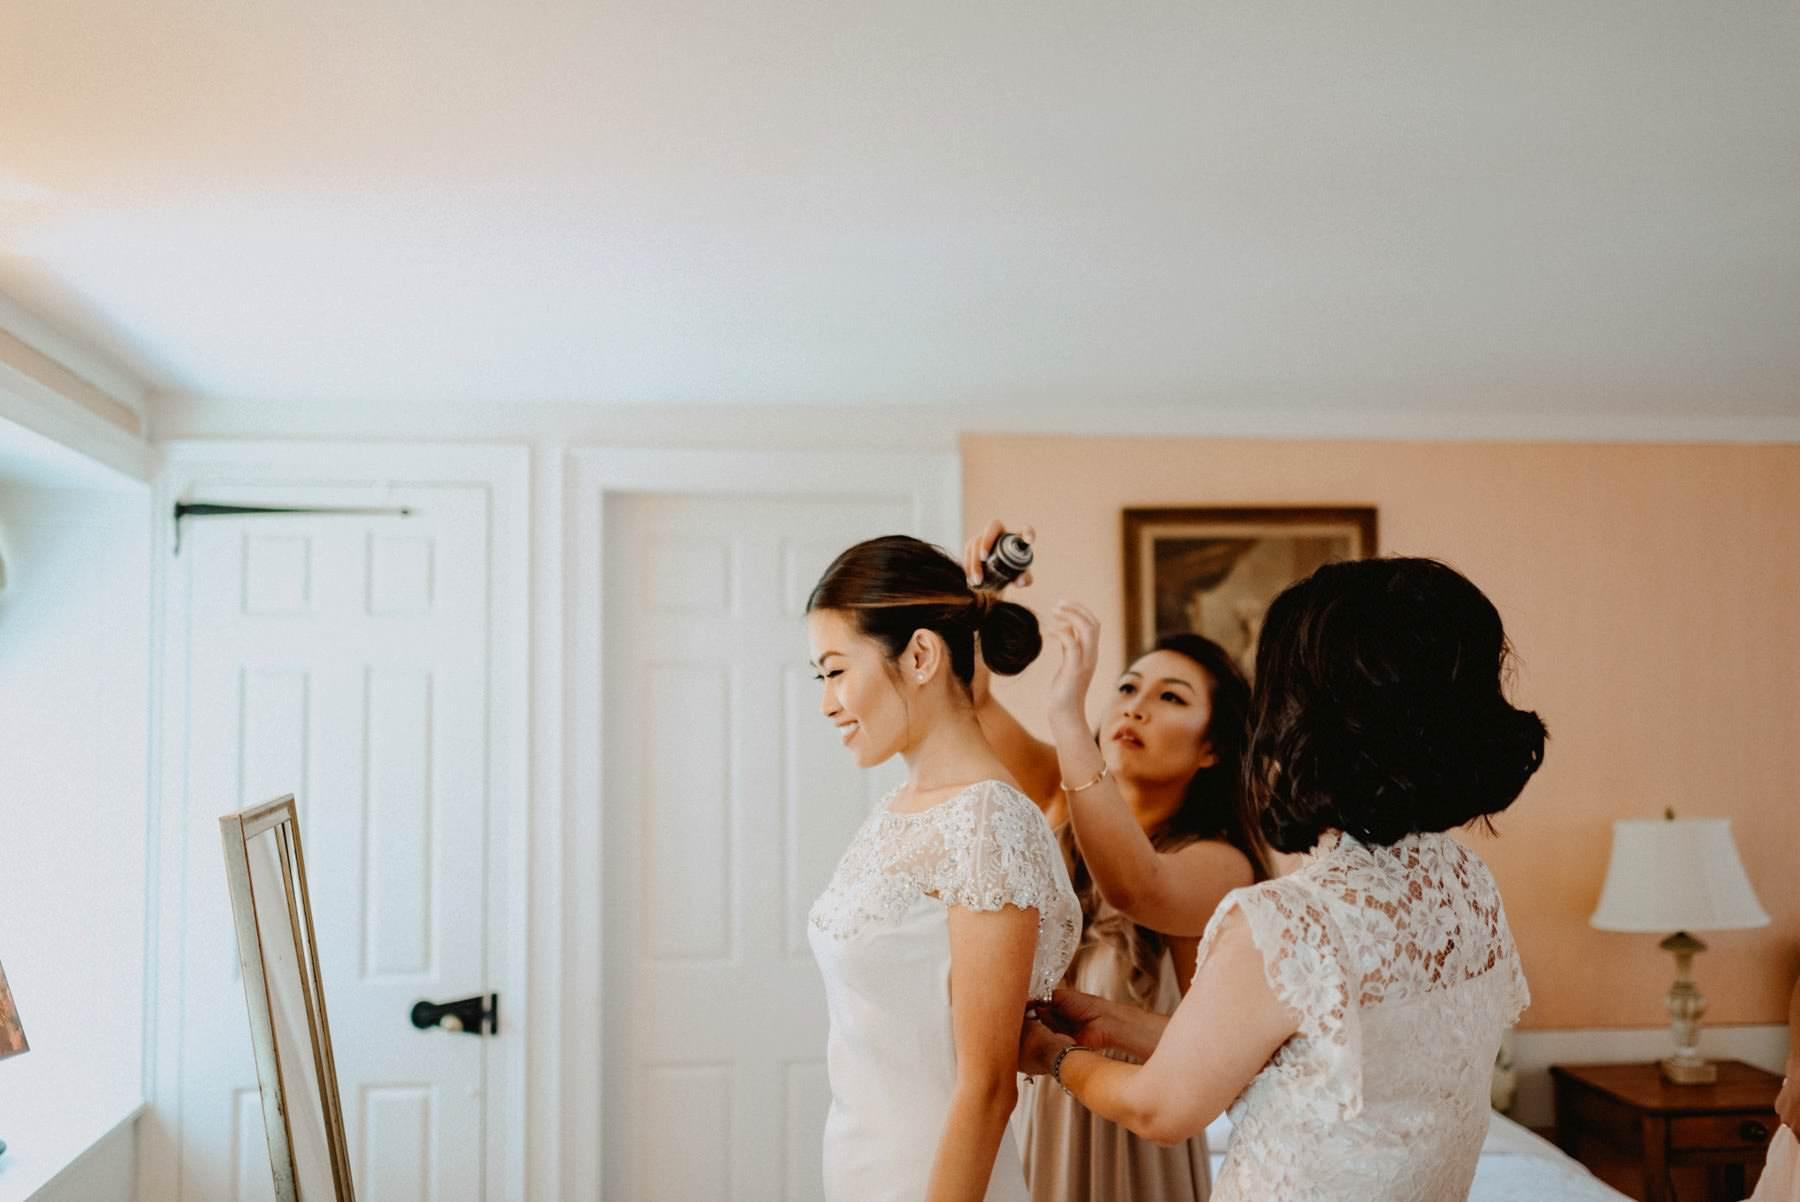 Appleford-estate-wedding-37.jpg